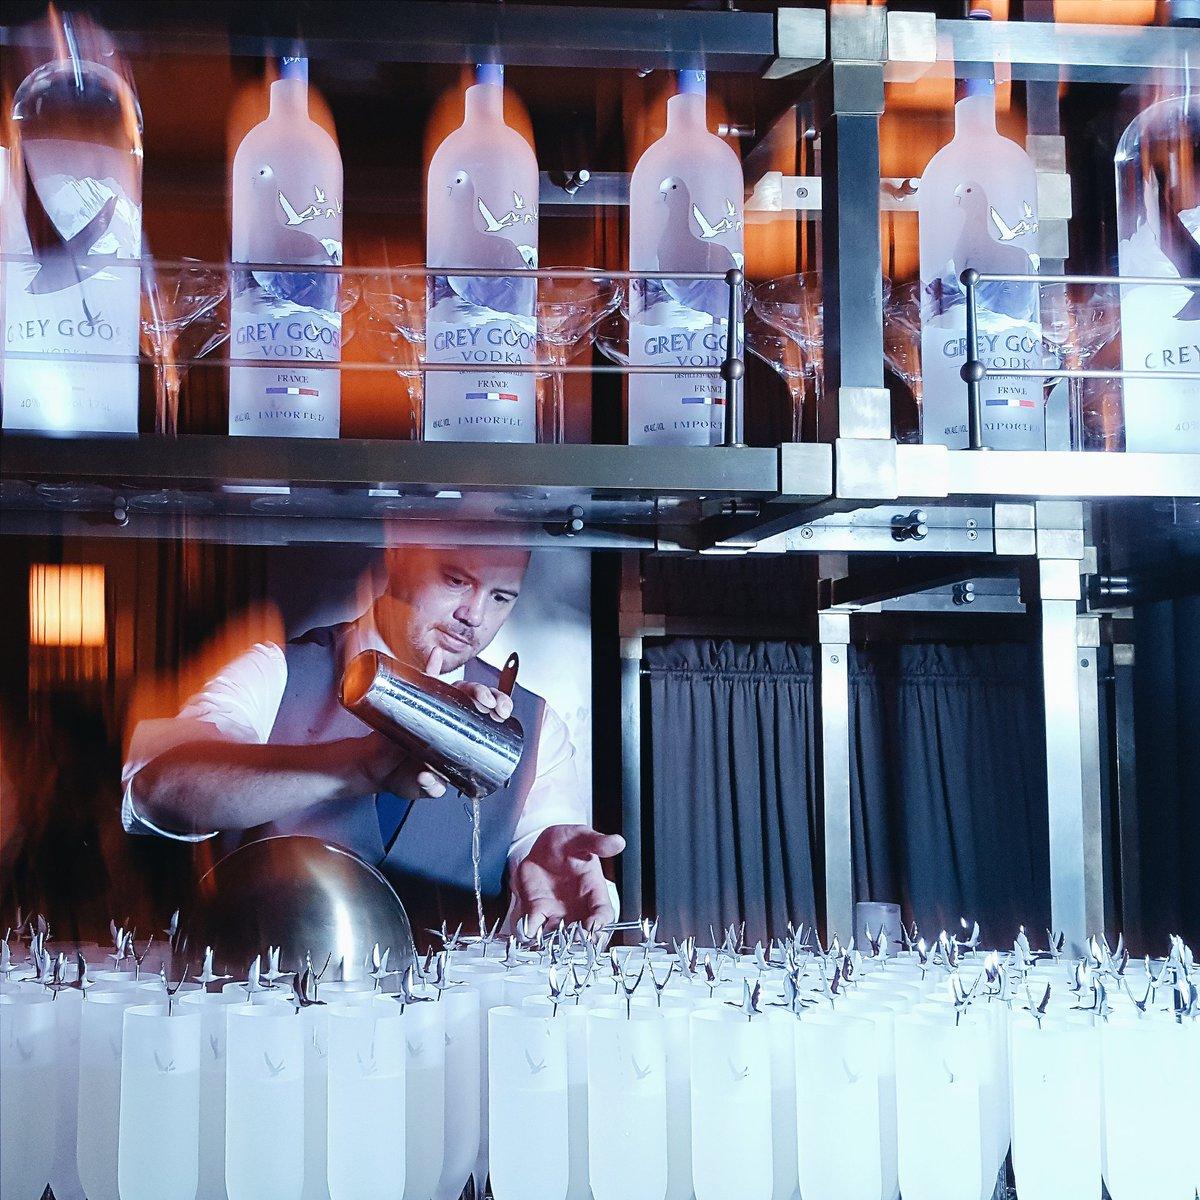 BAFTA after party #FlyBeyond #BAFTA #bafta2016 #GREYGOOSELeFizz #HarveyWeinstein @GreyGooseUK https://t.co/lUnHXaqpYP